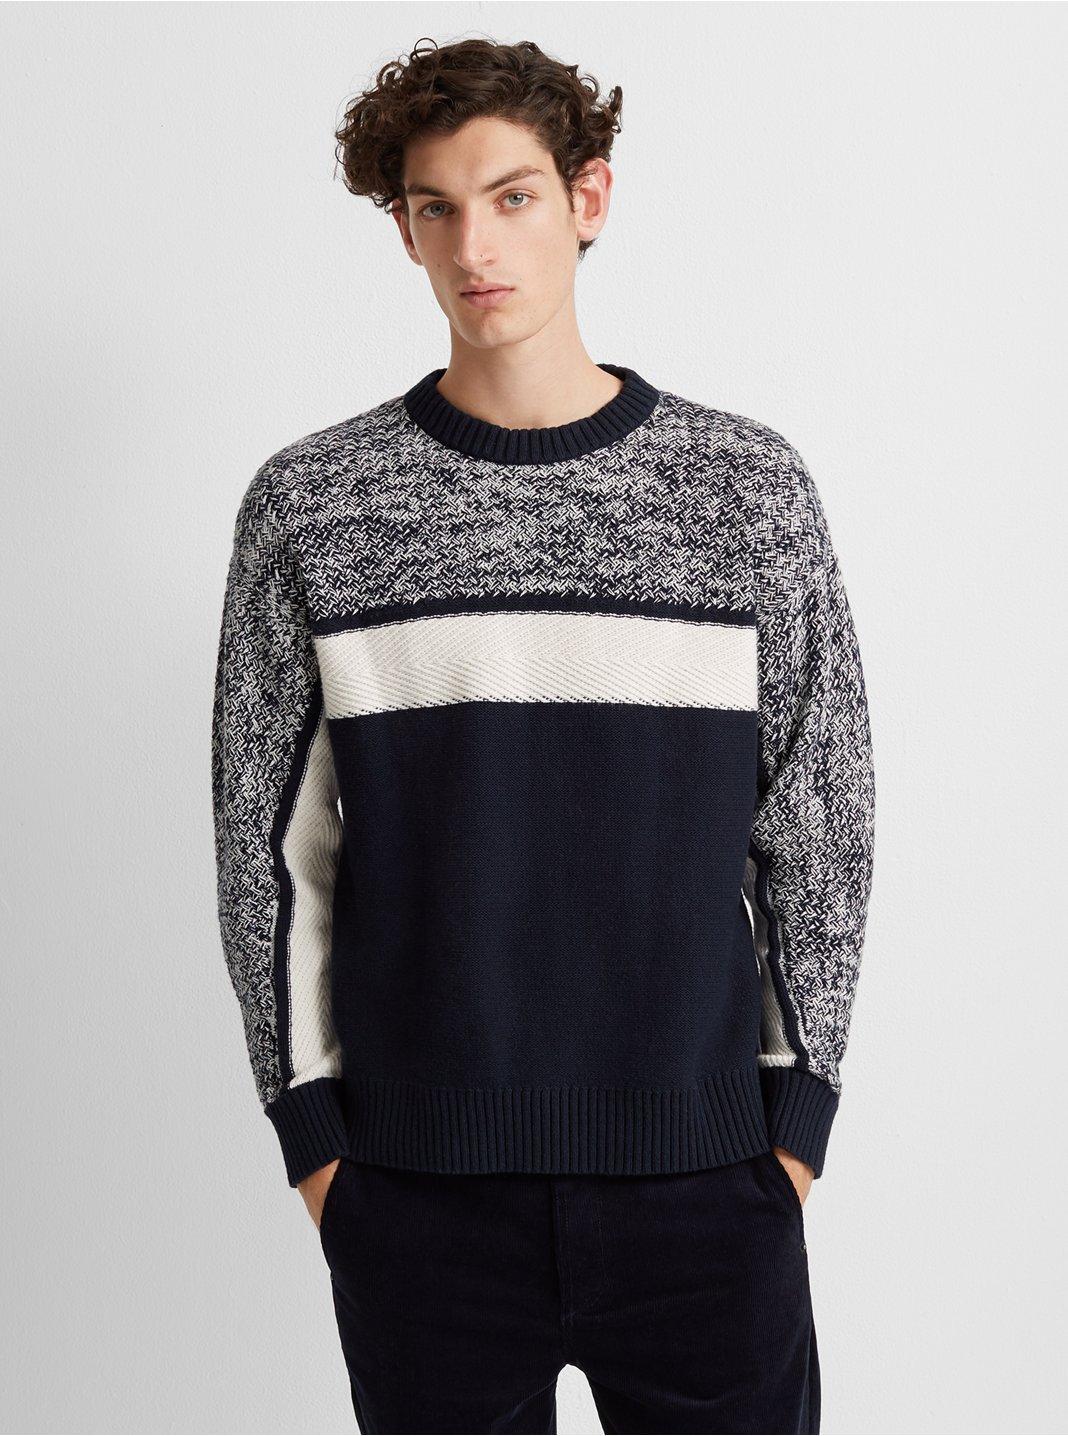 Fisherman Crewneck Sweater